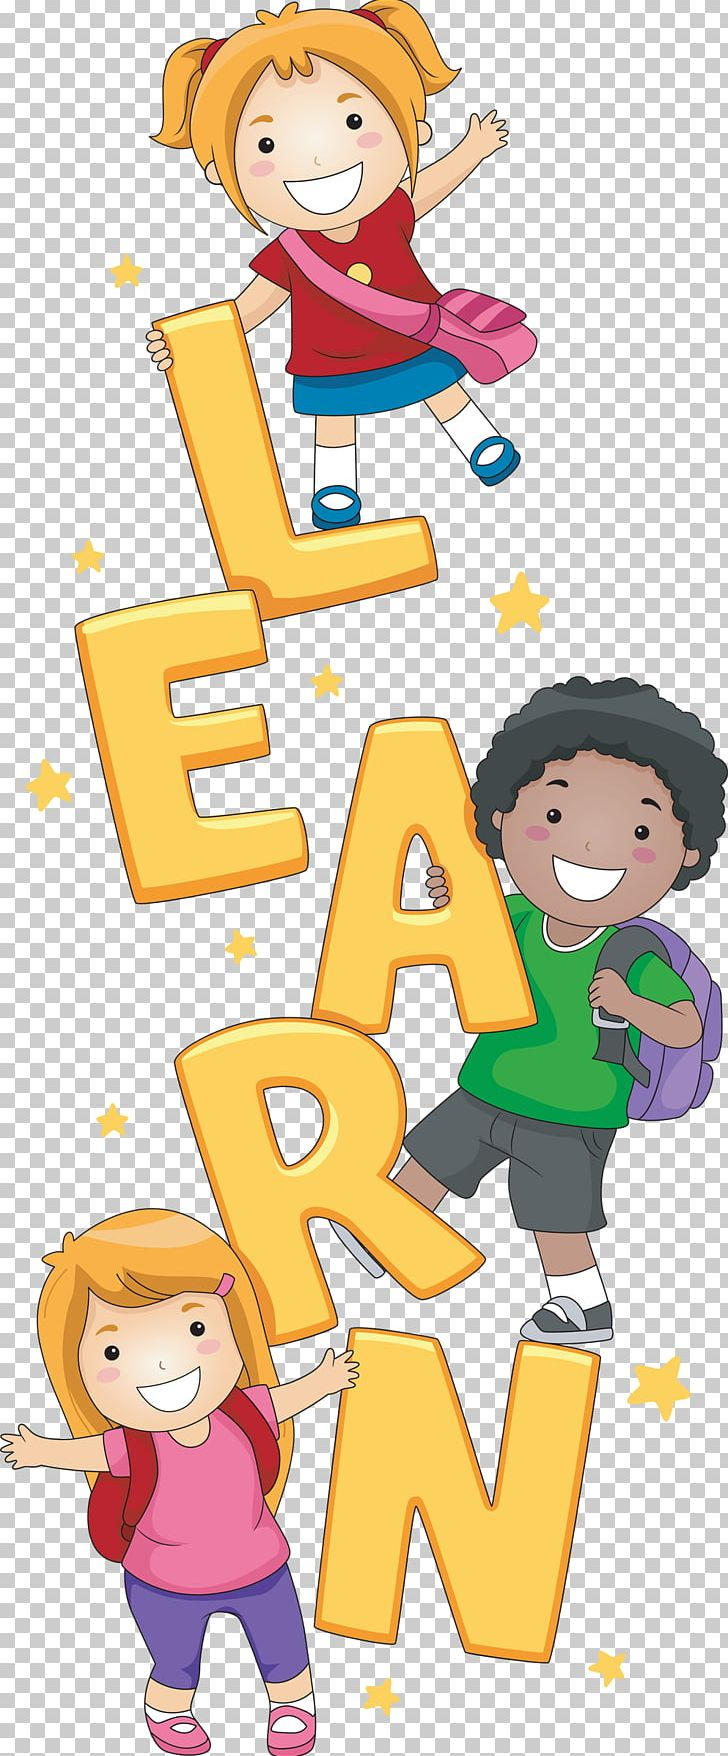 Parent Child Learning Education PNG, Clipart, Area, Art, Artwork.